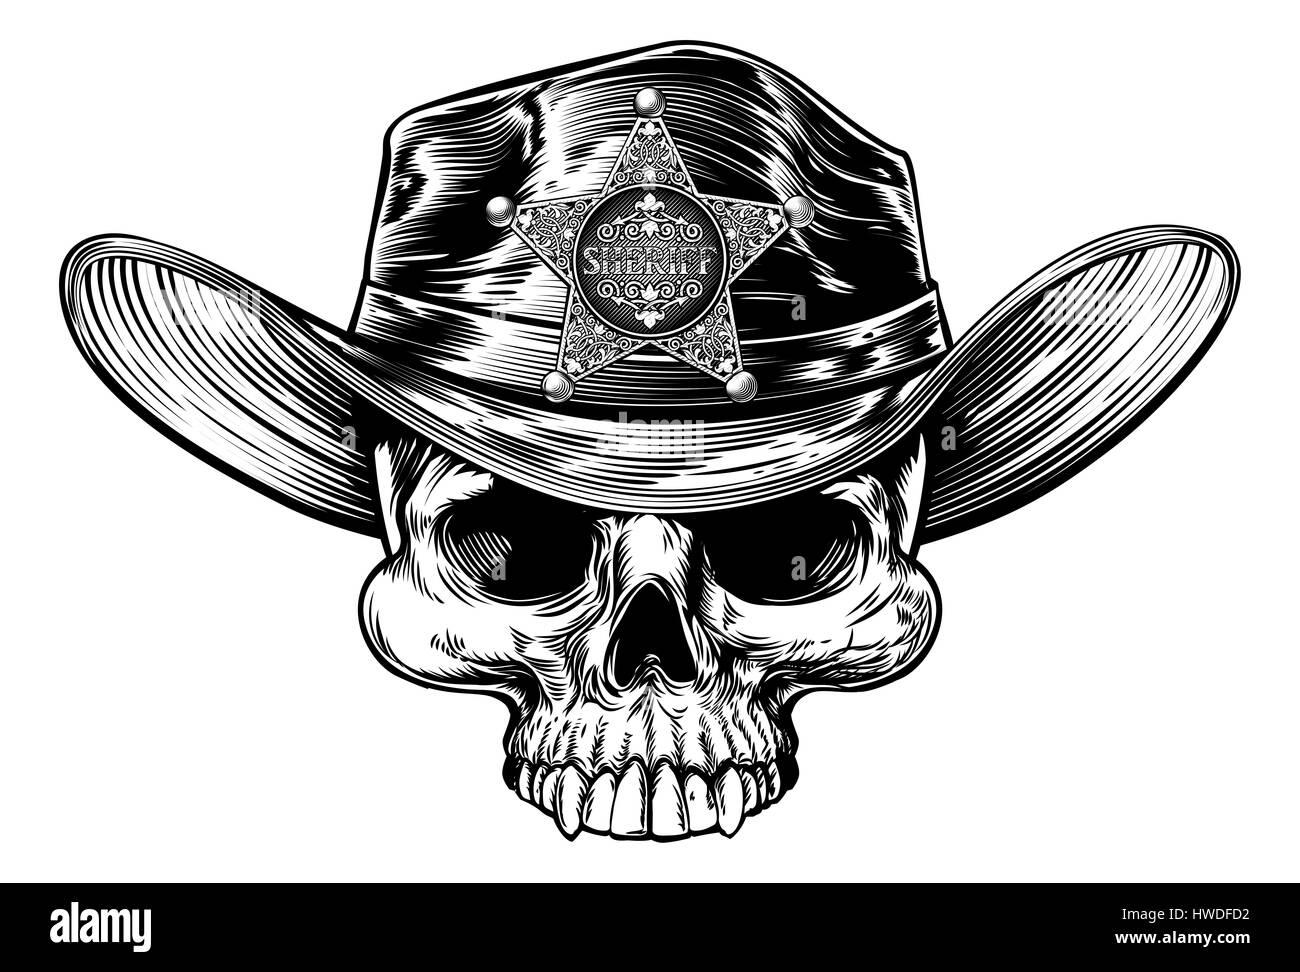 Cowboy skull wering un cappello da cowboy con una stella sheriff badge  disegno in un vintage retrò xilografia incisa o stile inciso 58127b7ae179